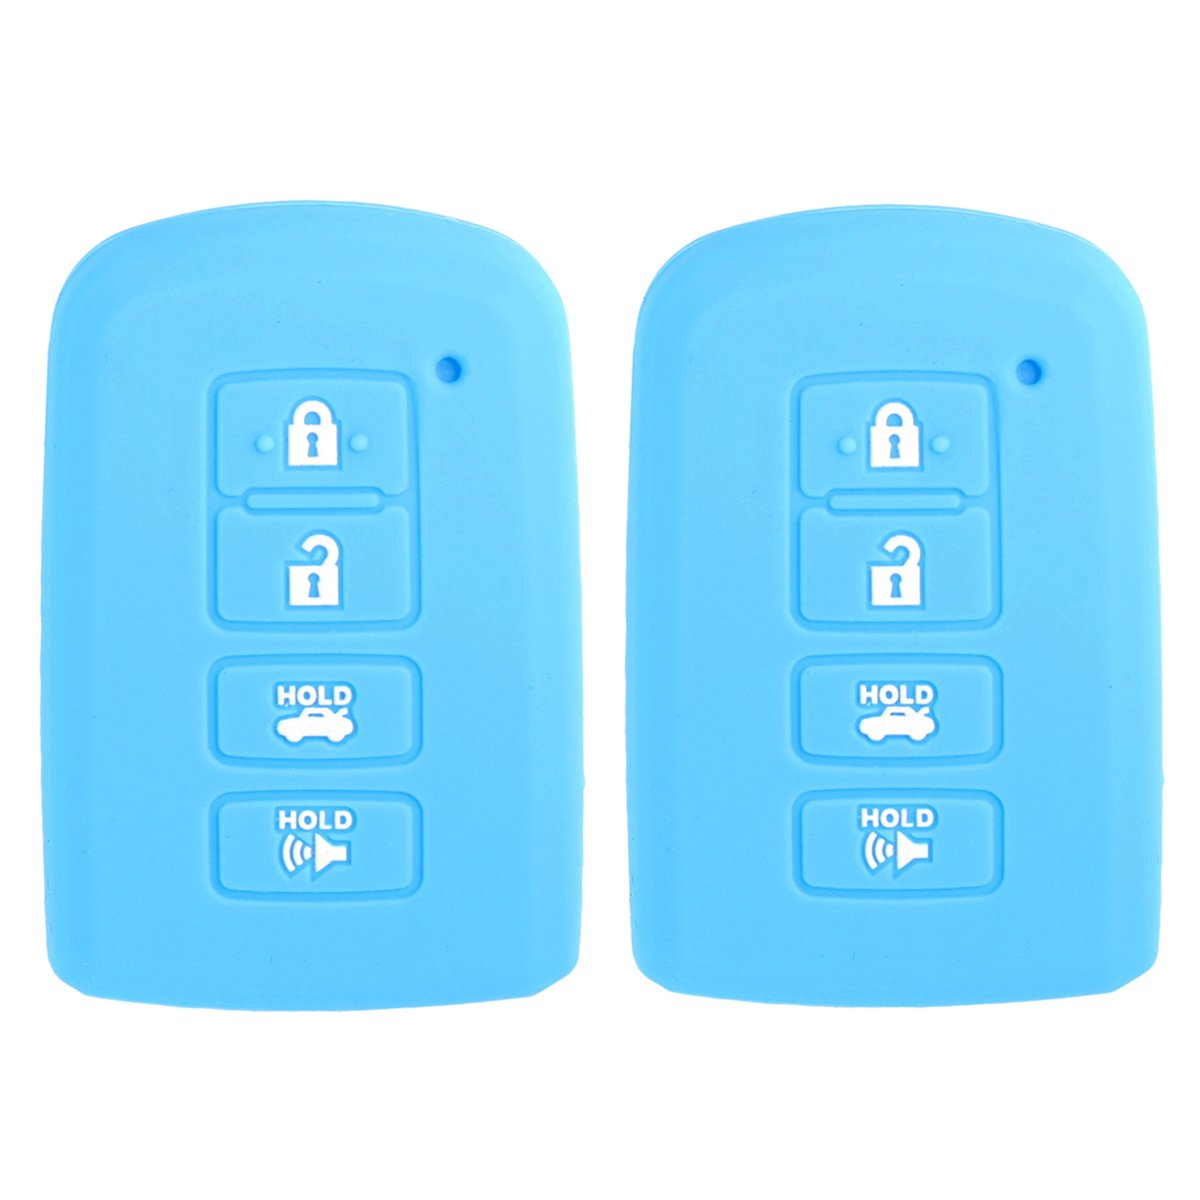 2Pcs WERFDSR Sillicone key fob Skin key Cover Keyless Entry smart Remote Case Protector Shell for 2012 2013 2014 2015 2016 TOYOTA Avalon Camry Corolla Highlander RAV4 Black Blue